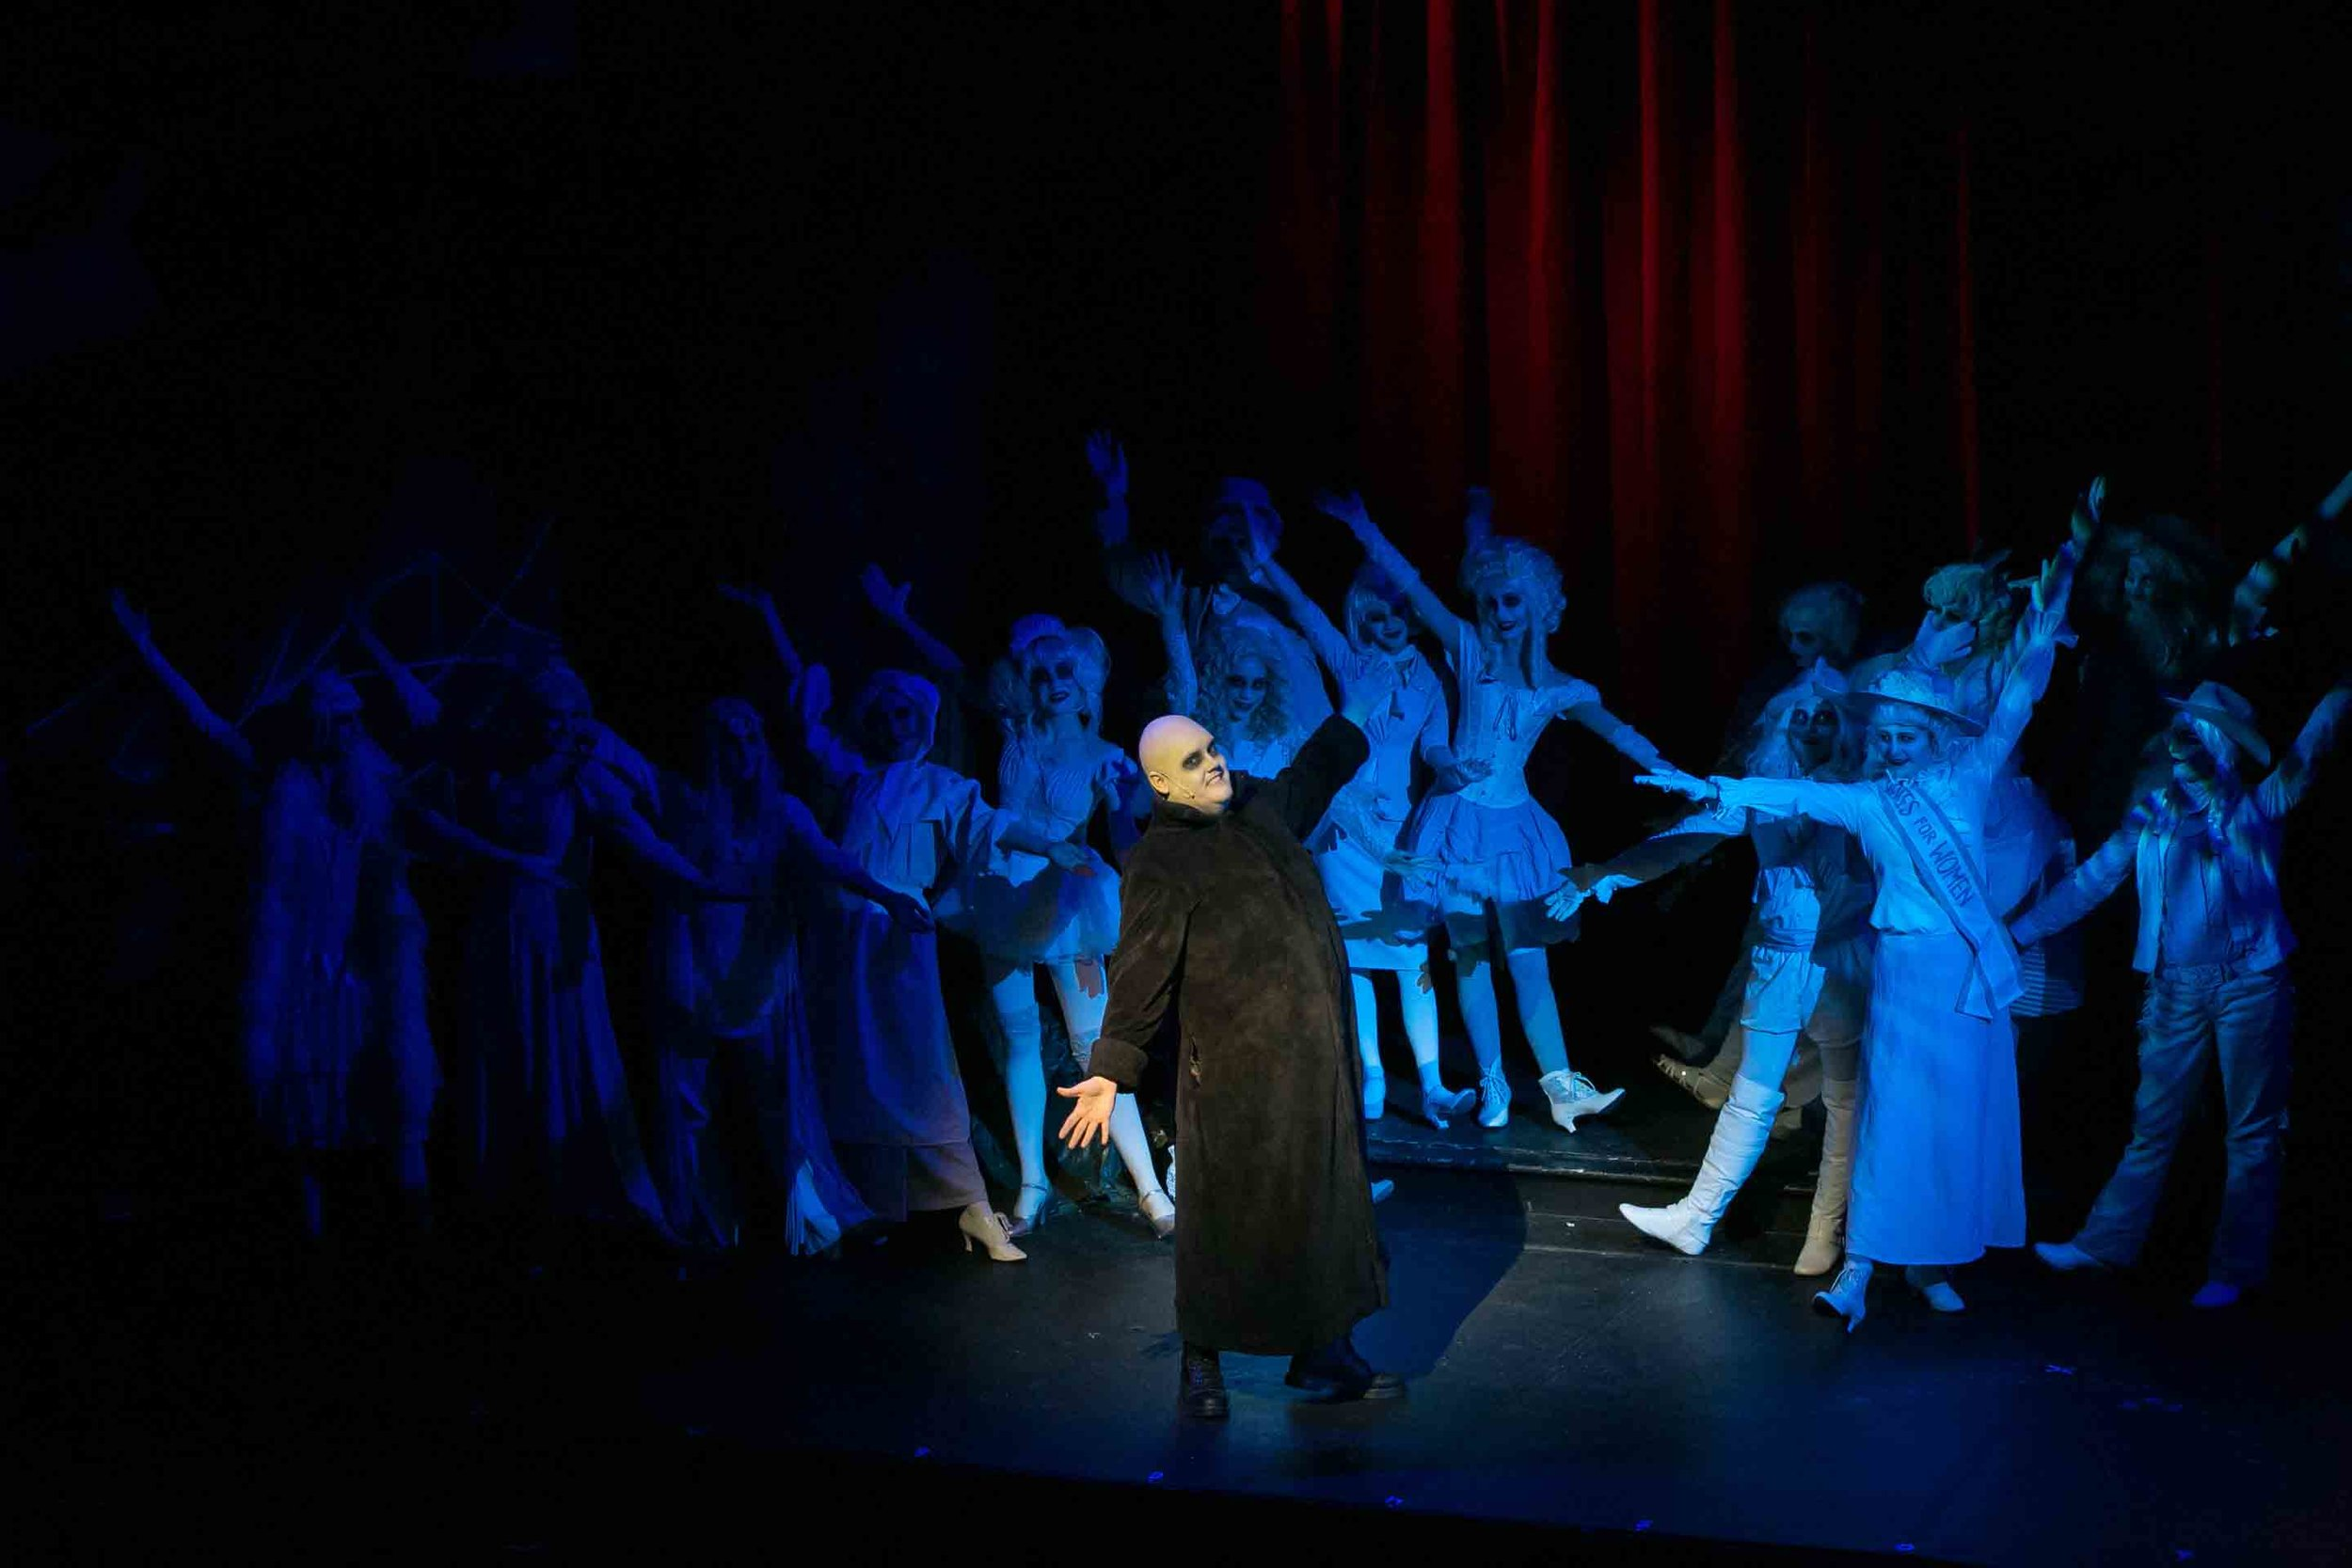 6-19-16 Addams Family Creepy Cast 0146.jpg